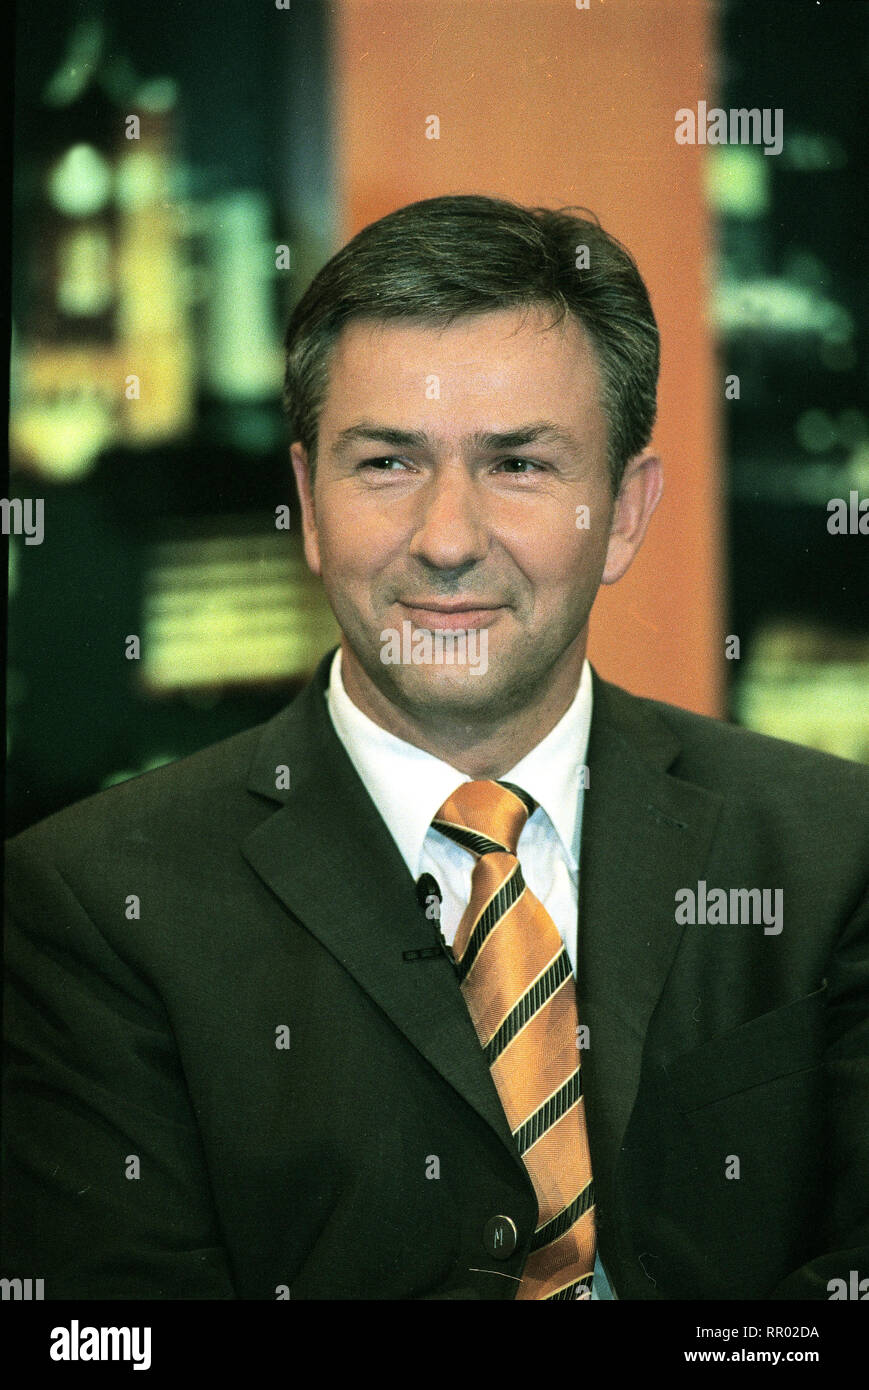 KLAUS WOWEREIT / KLAUS WOWEREIT - Politiker, SPD / Überschrift: KLAUS WOWEREIT Stock Photo